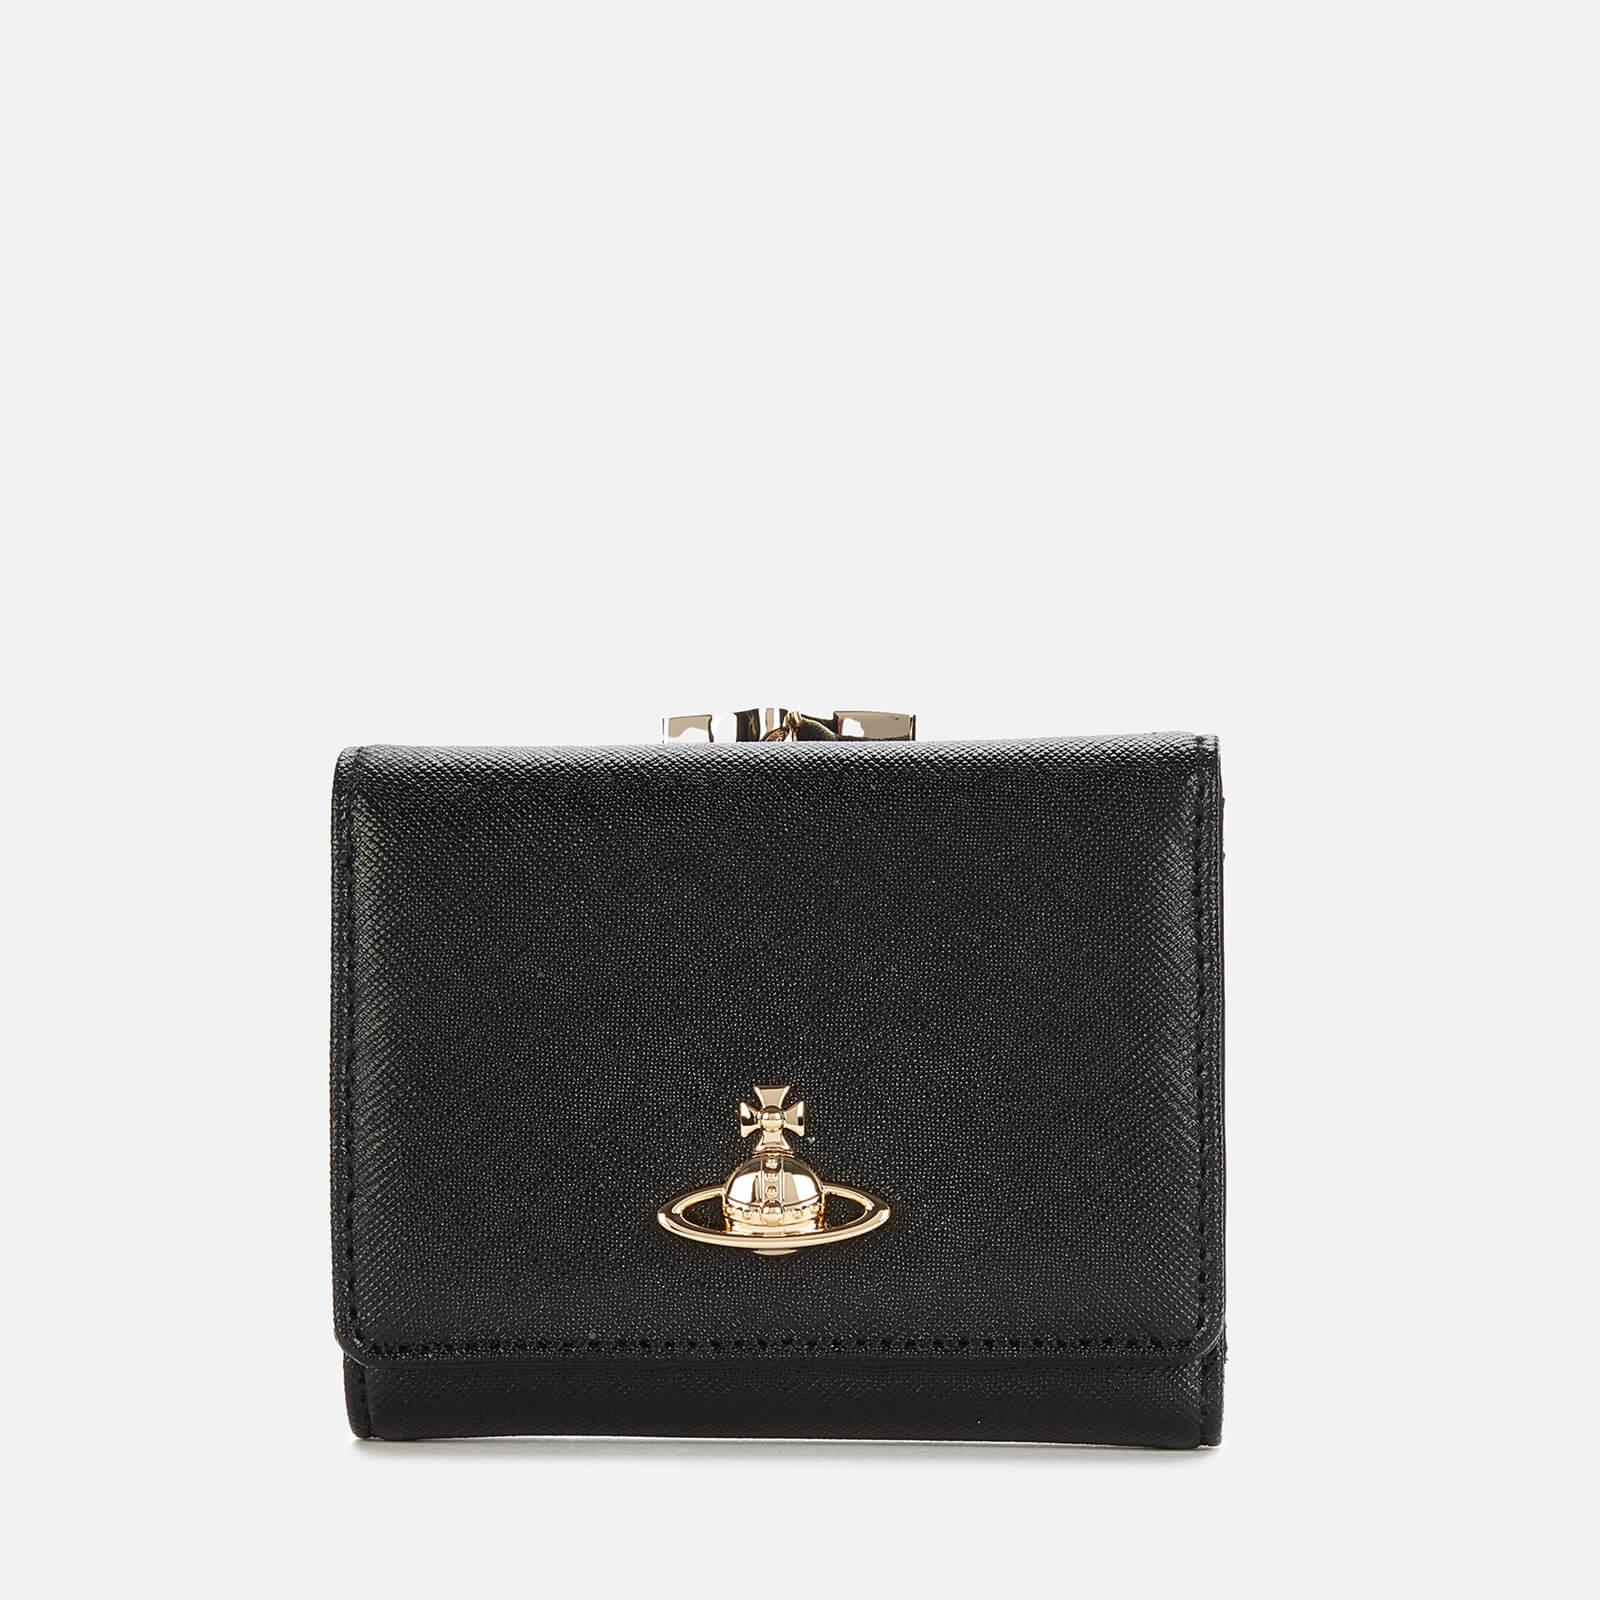 Vivienne Westwood Women's Victoria Small Frame Wallet - Black